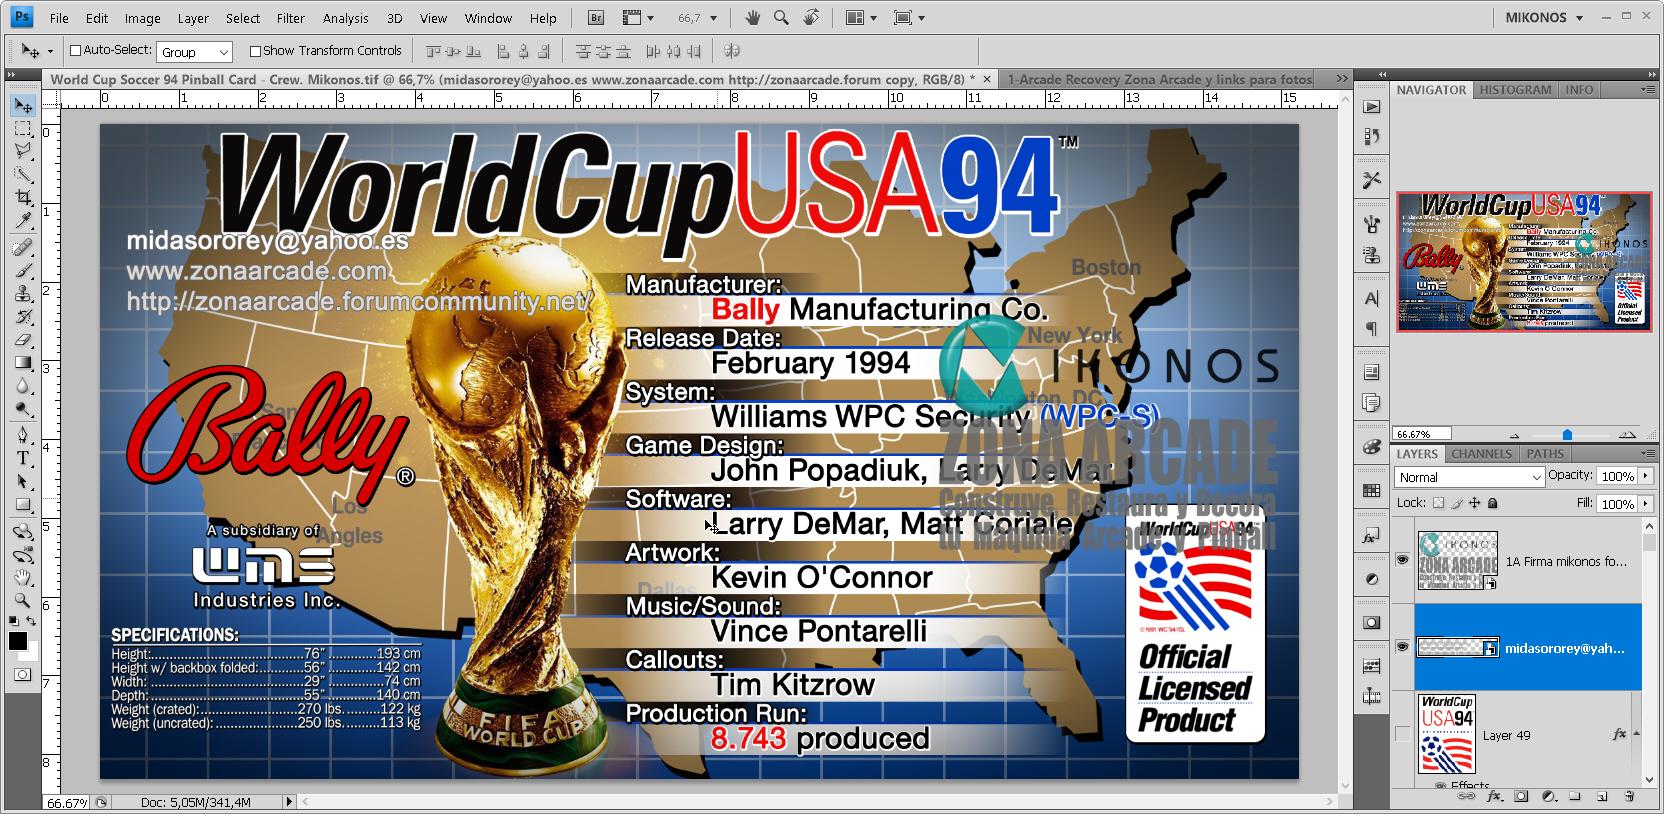 World%20Cup%20Soccer%20Pinball%20Card%20Customized%20-%20Crew.%20Mikonos1.jpg